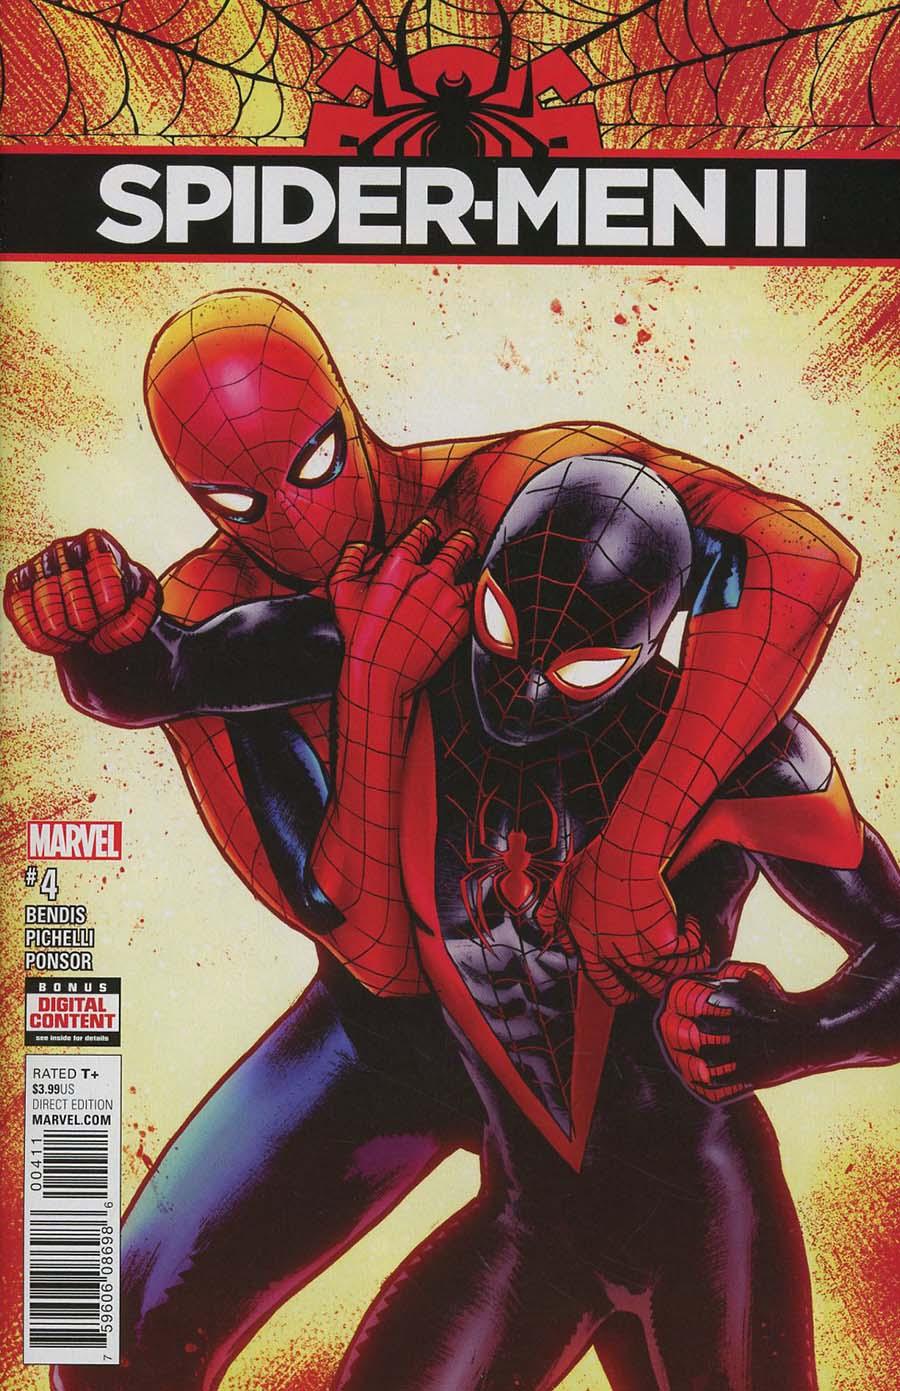 Spider-Men II #4 Cover A Regular Sara Pichelli Cover